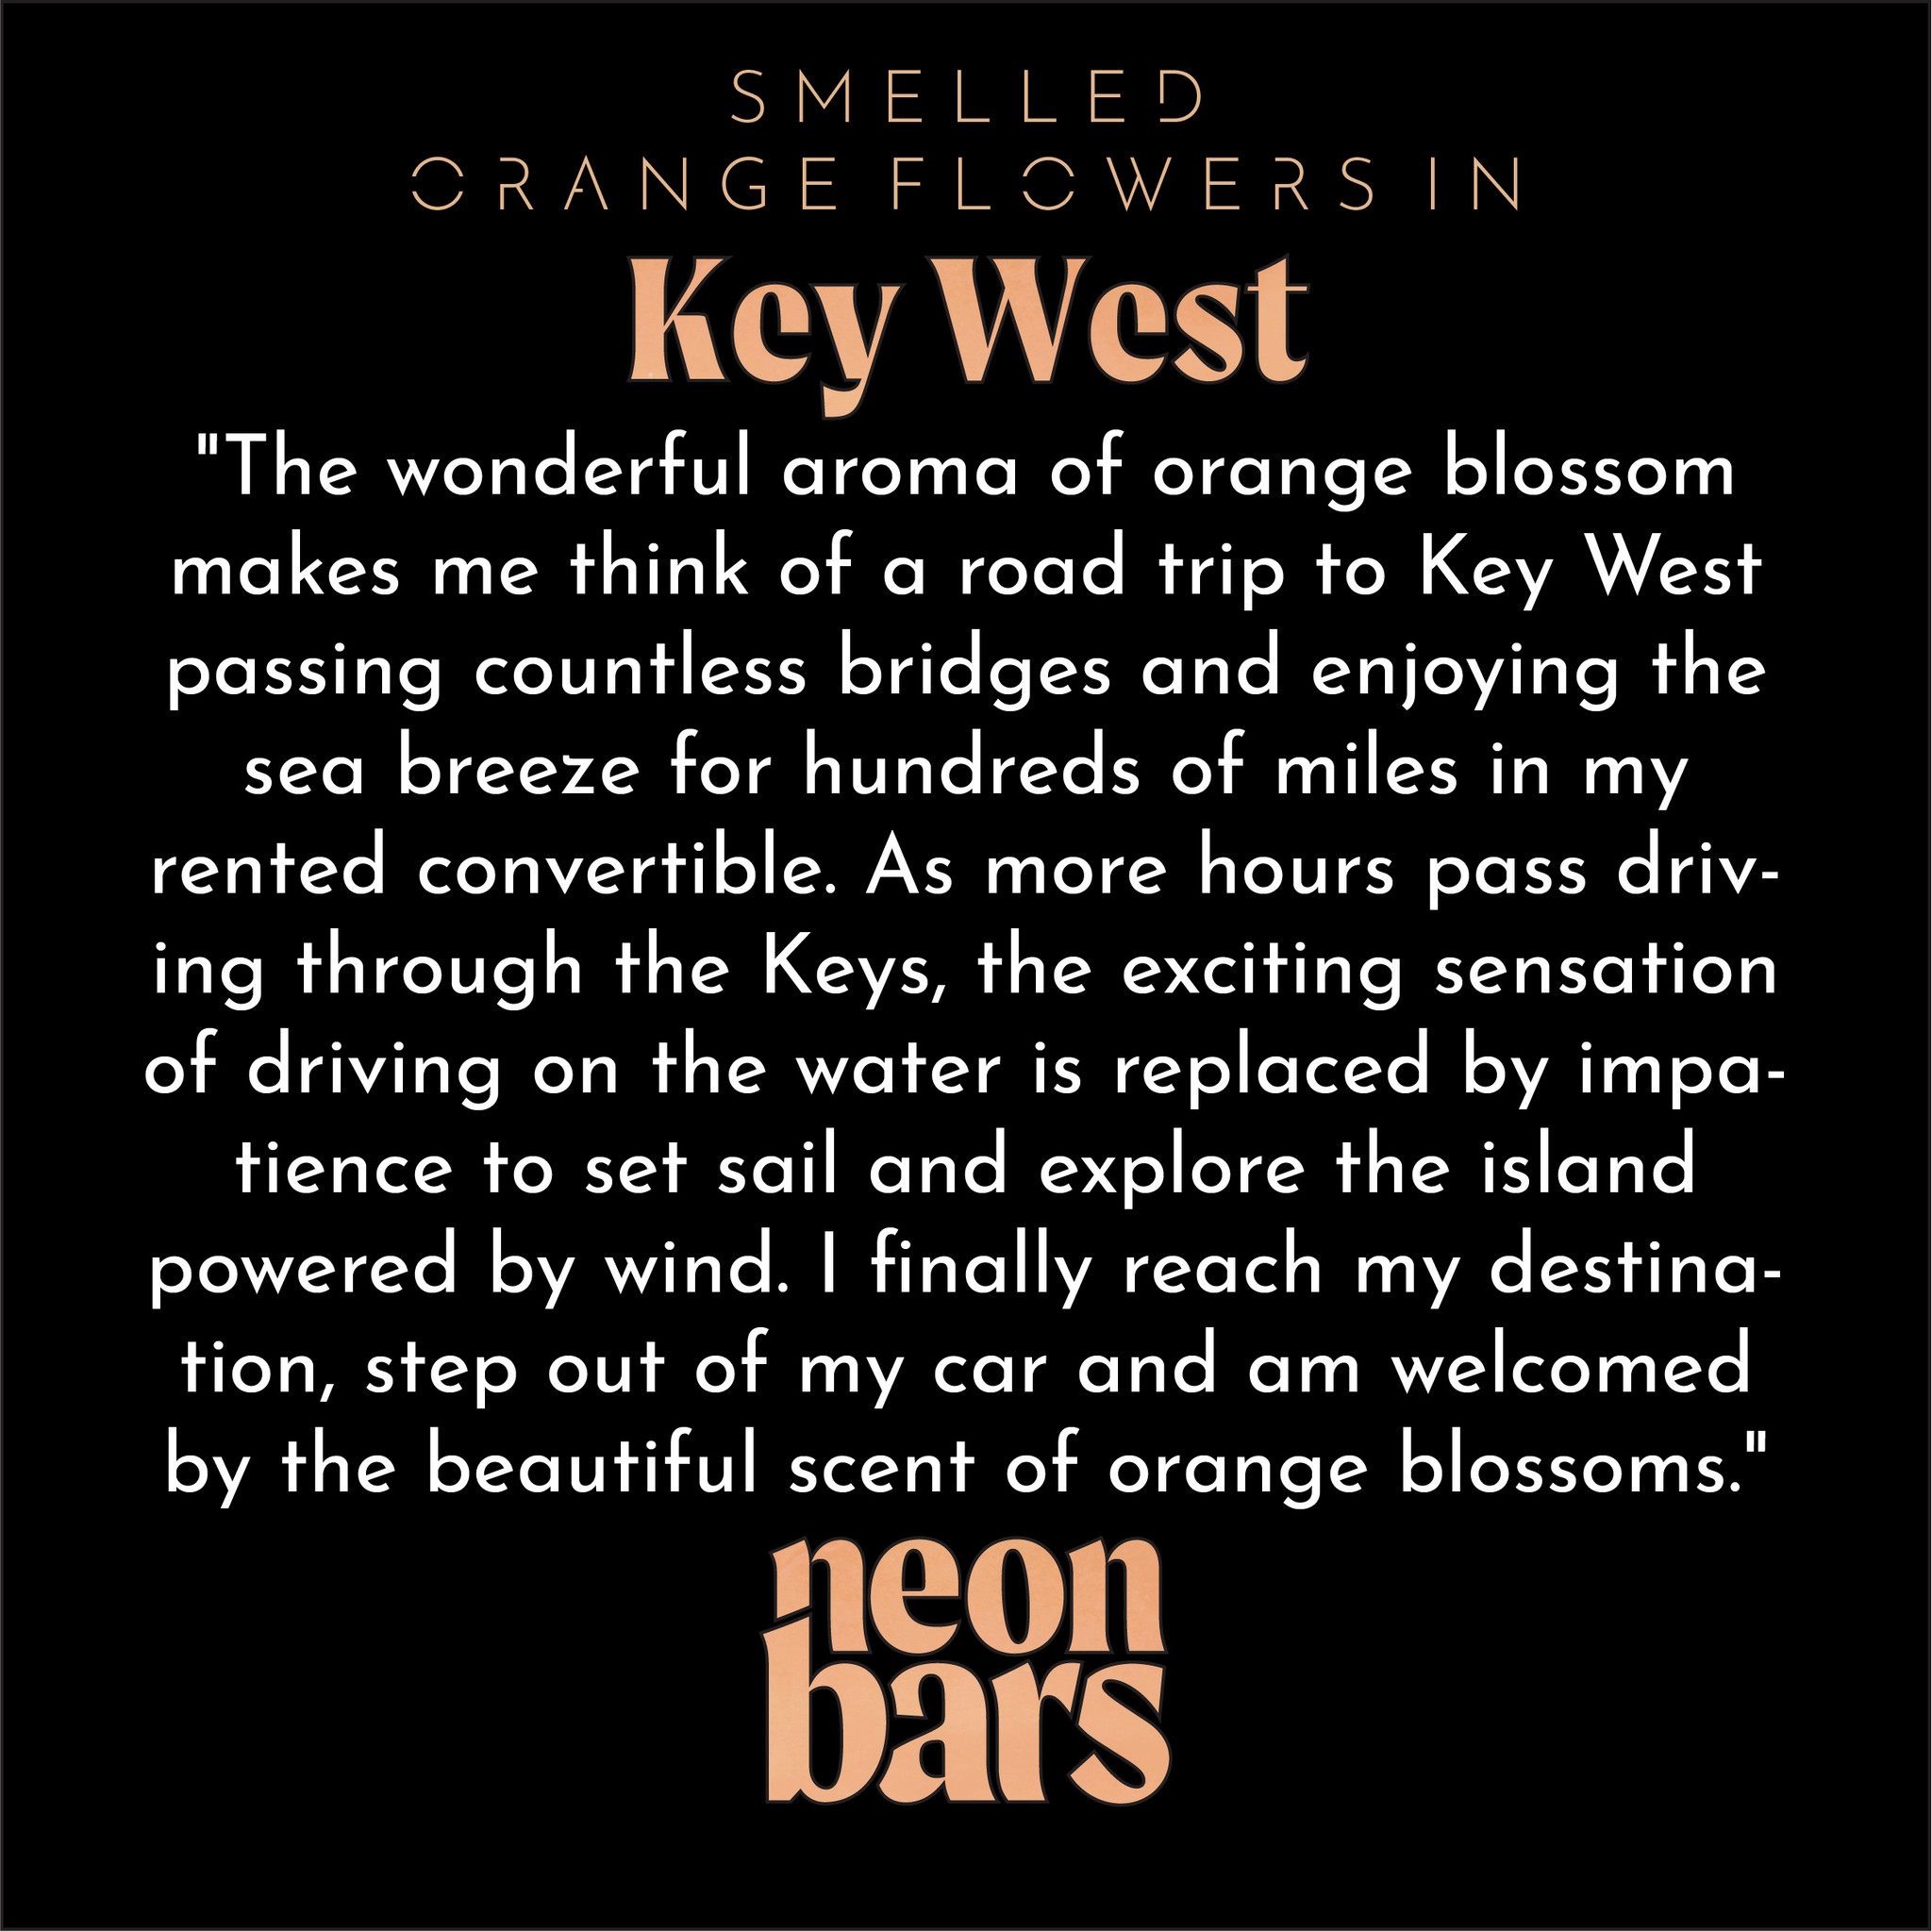 smelled orange flowers in Key West